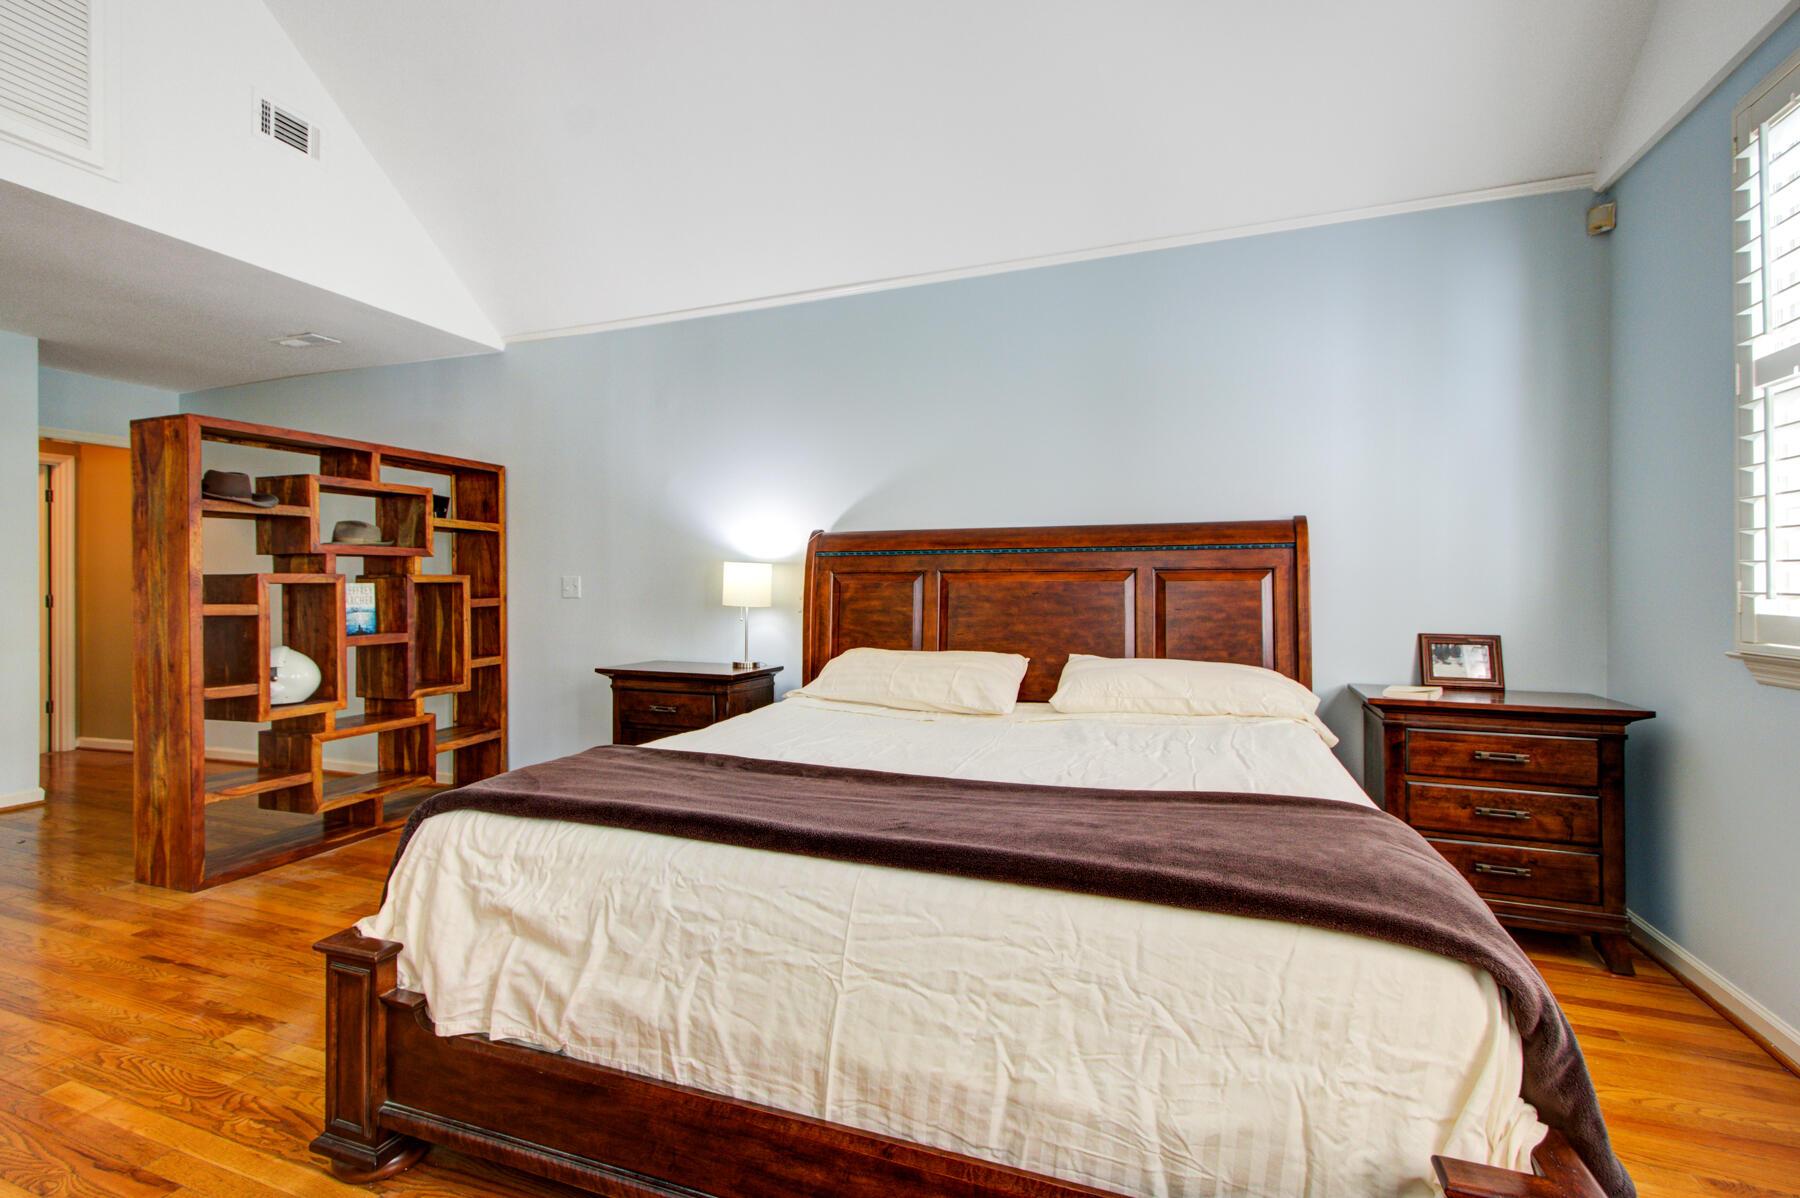 Radcliffeborough Homes For Sale - 48 Radcliffe, Charleston, SC - 2